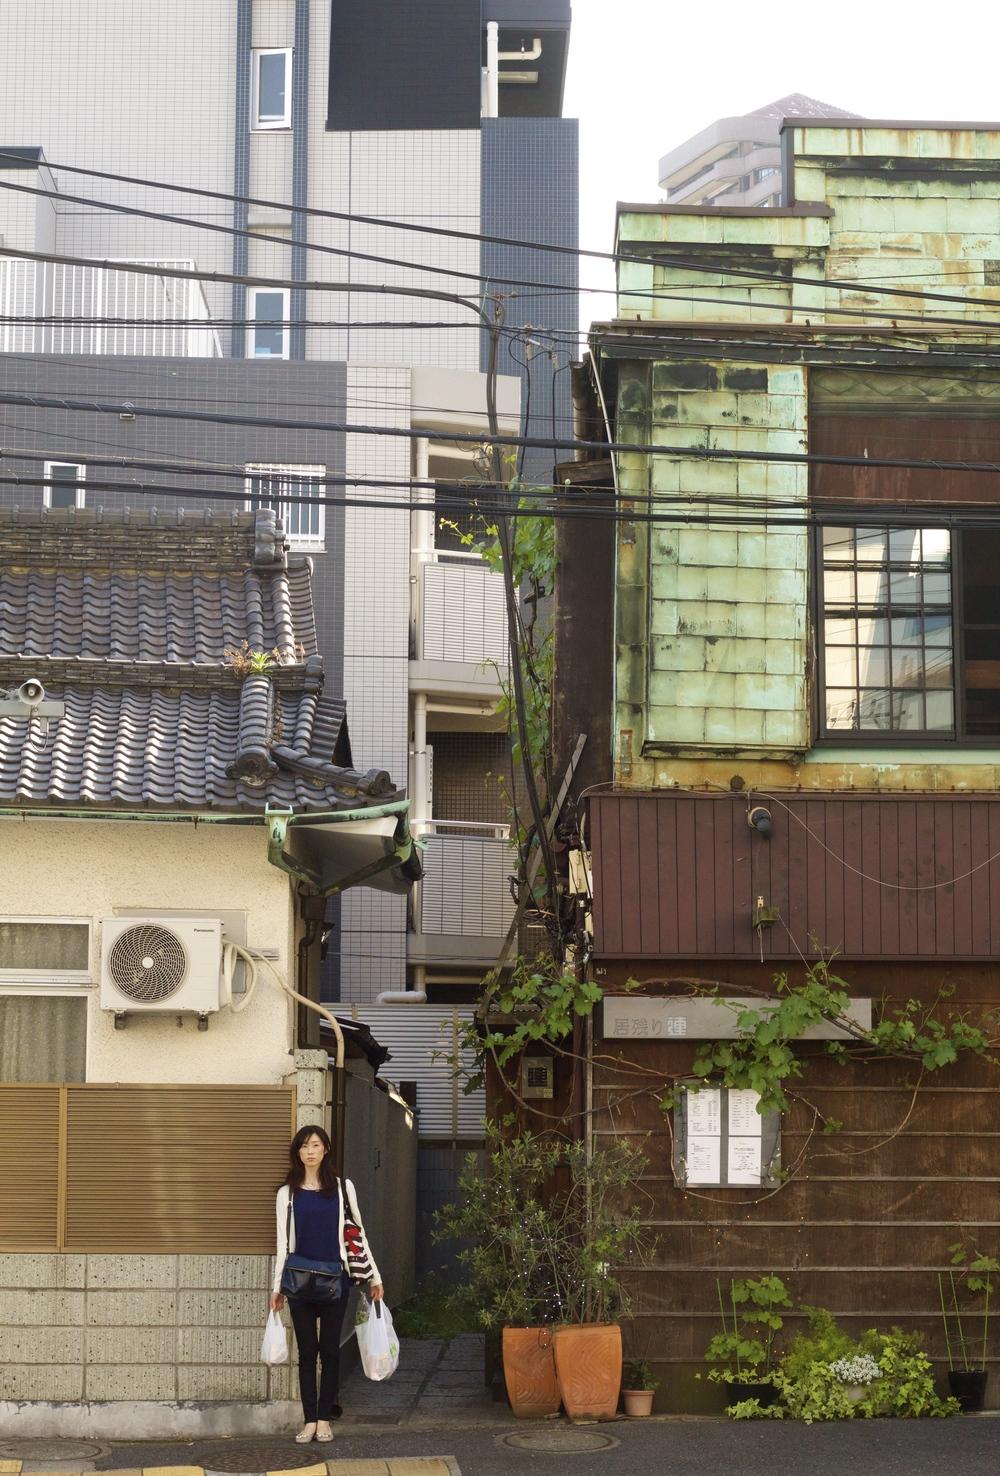 Esquina de Shinagawa. Tokyo, Japón - Abril 2015